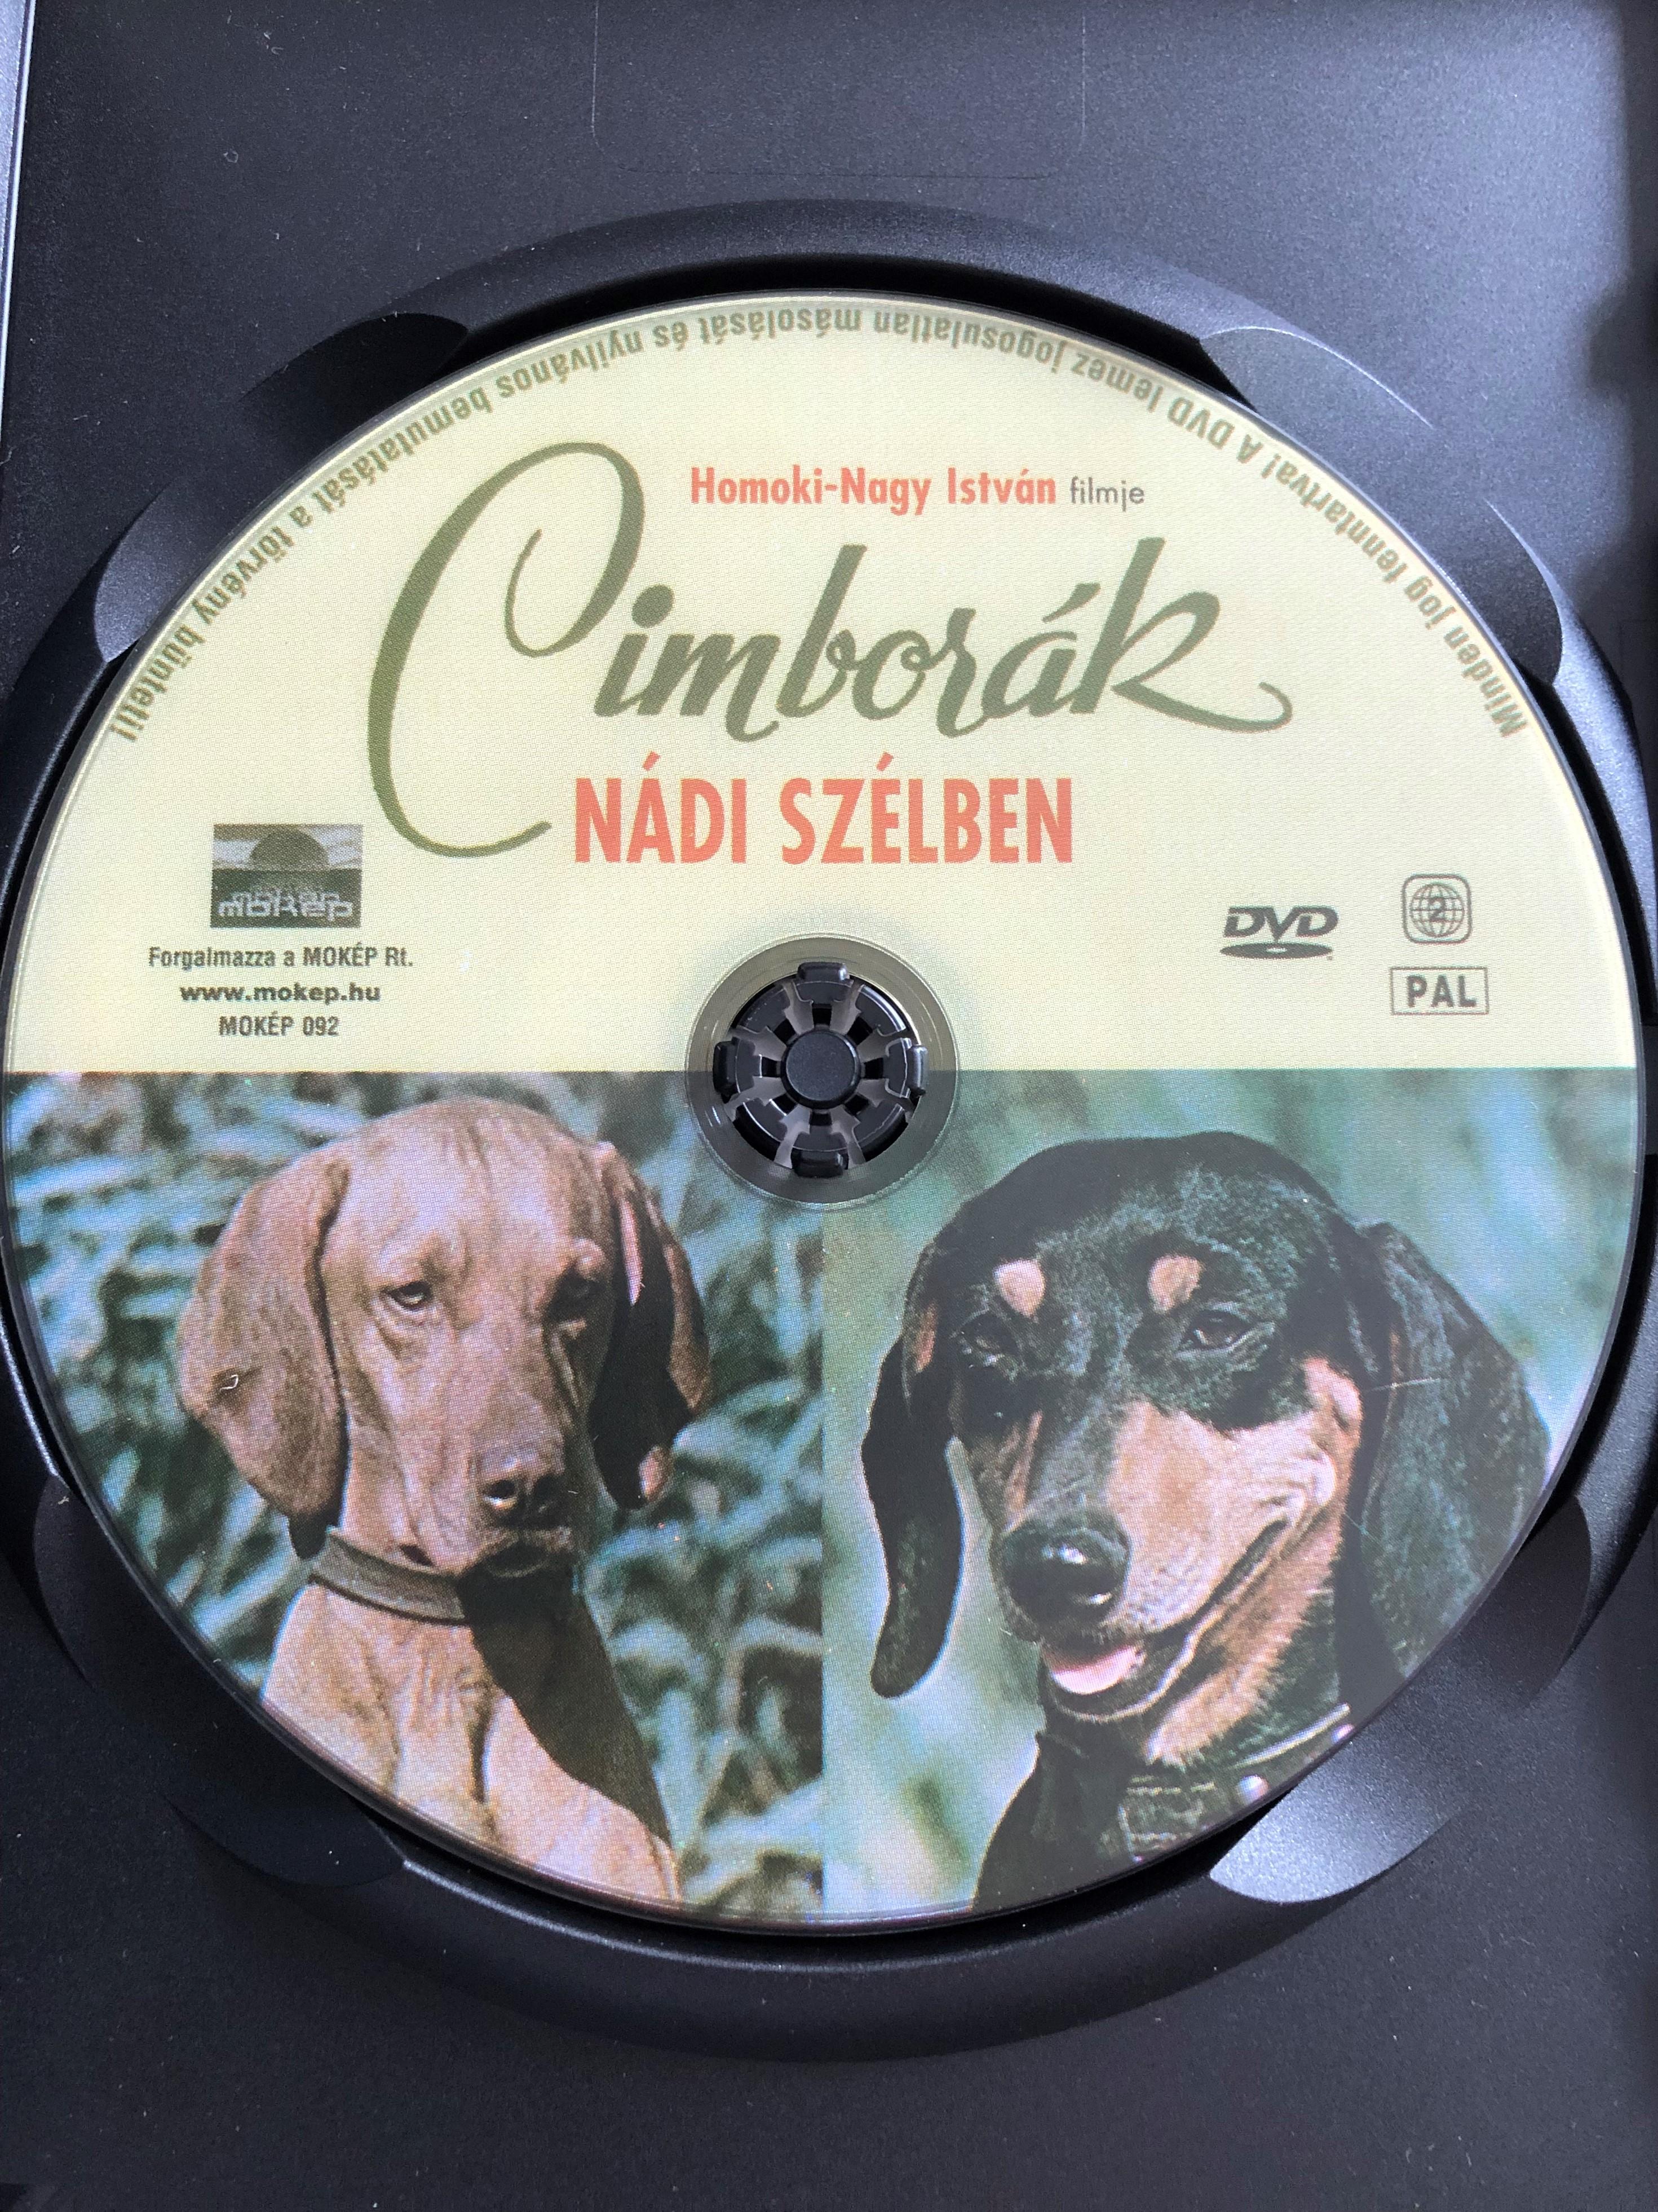 cimbor-k-n-di-sz-lben-dvd-1958-directed-by-istv-n-homoki-nagy-hungarian-nature-documentary-m-k-p-092-2-.jpg